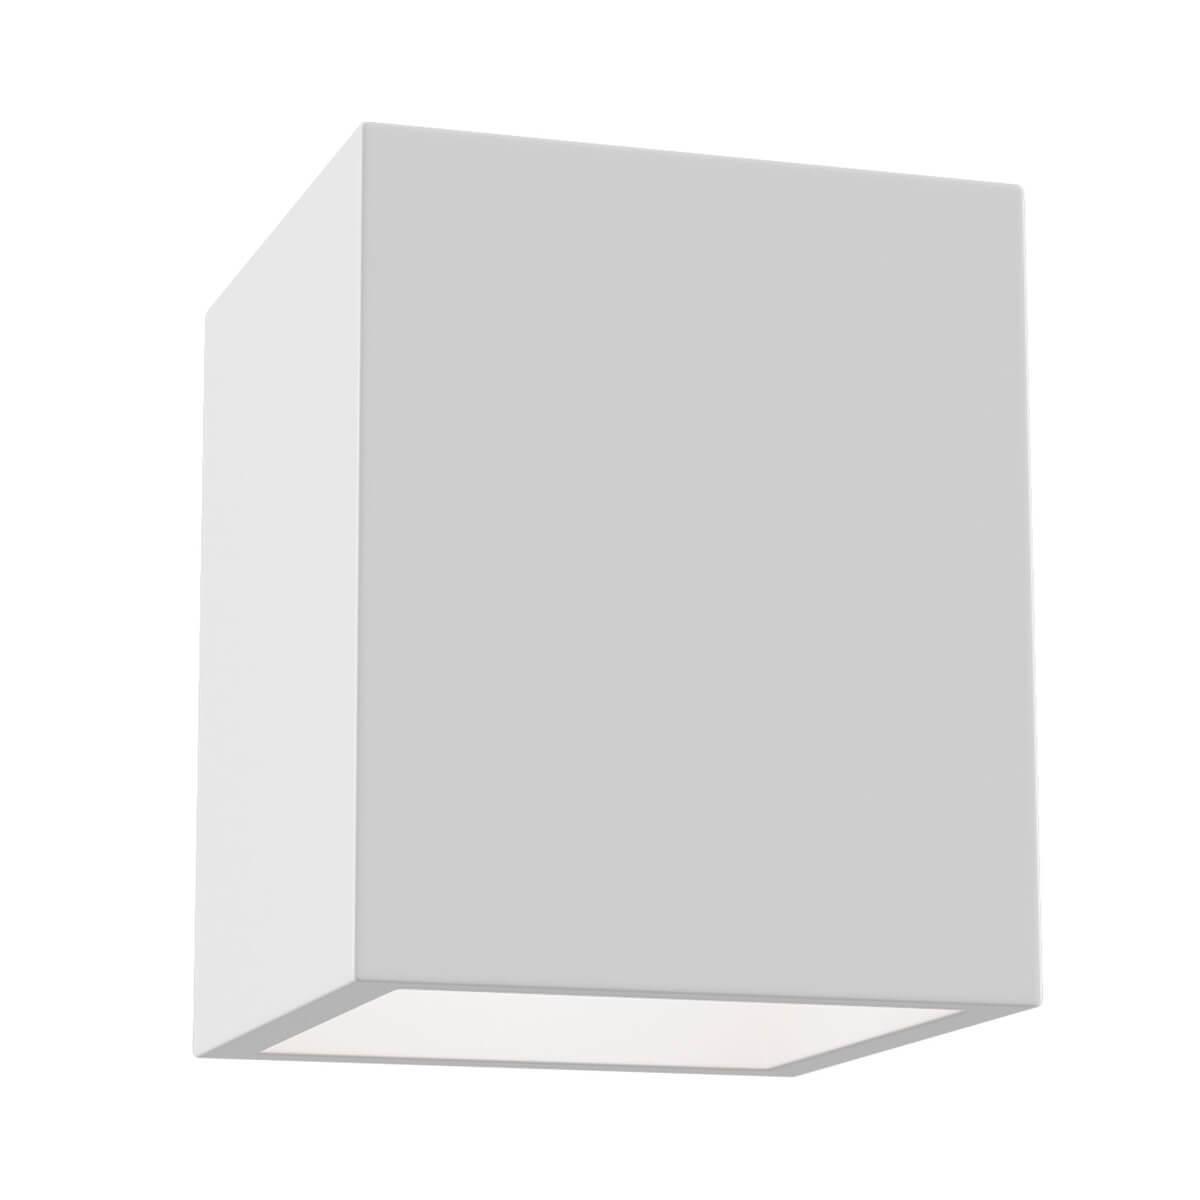 Светильник Maytoni C002CW-01W Conik Gyps (Возможна покраска)